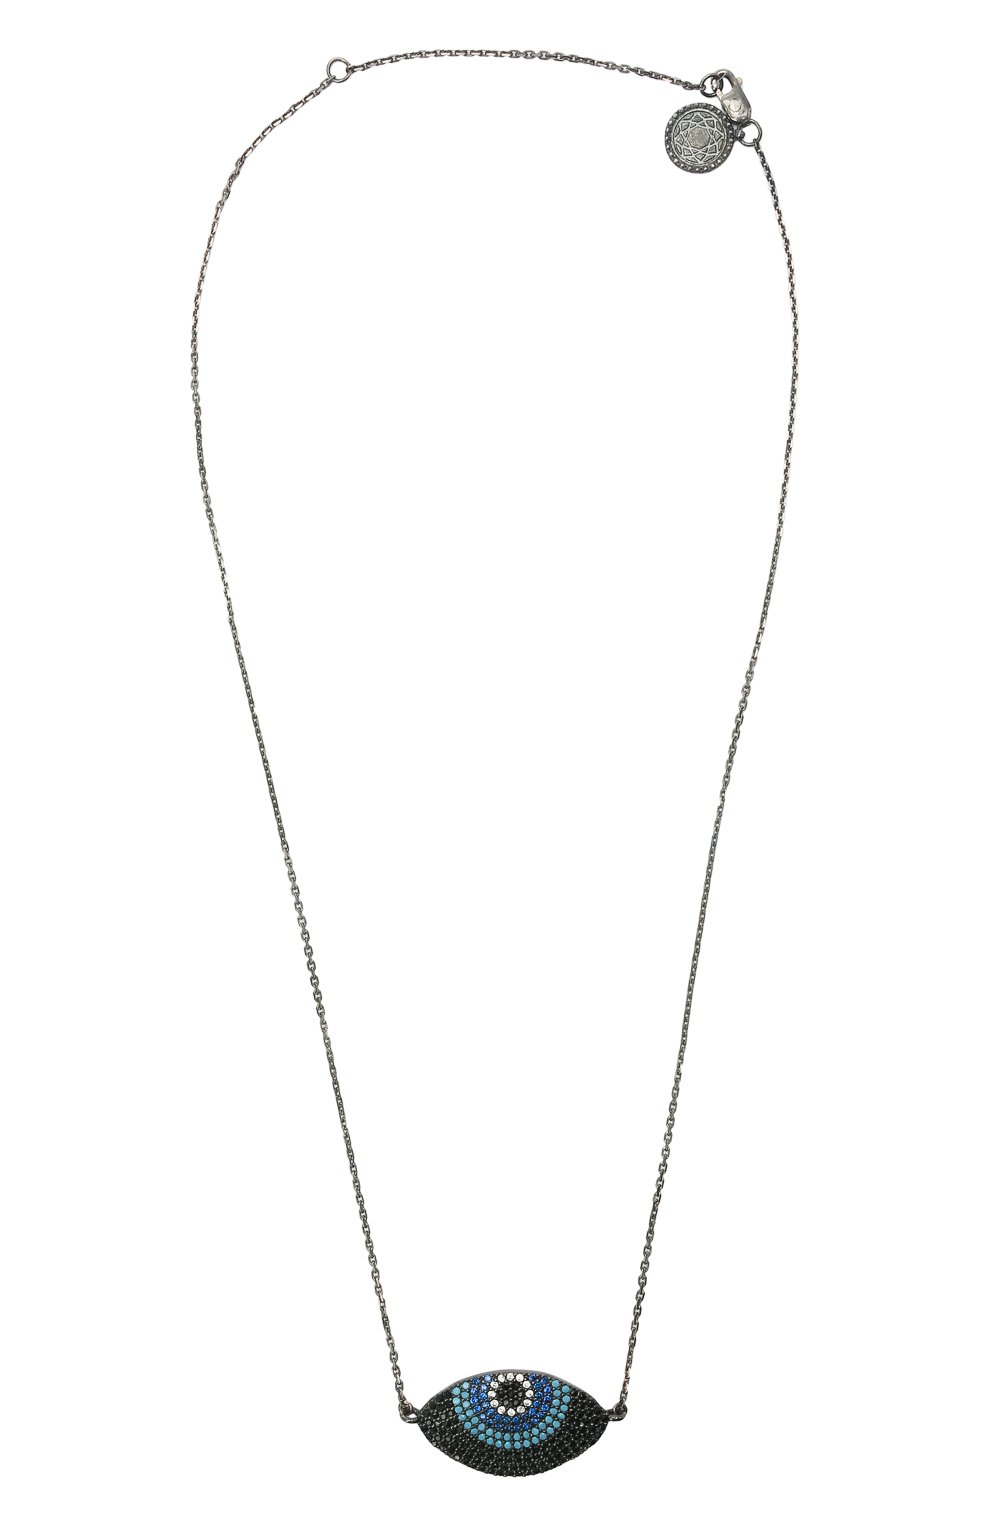 Женское колье глаз for fun DZHANELLI серебряного цвета, арт. 14738/090 | Фото 1 (Материал: Серебро)